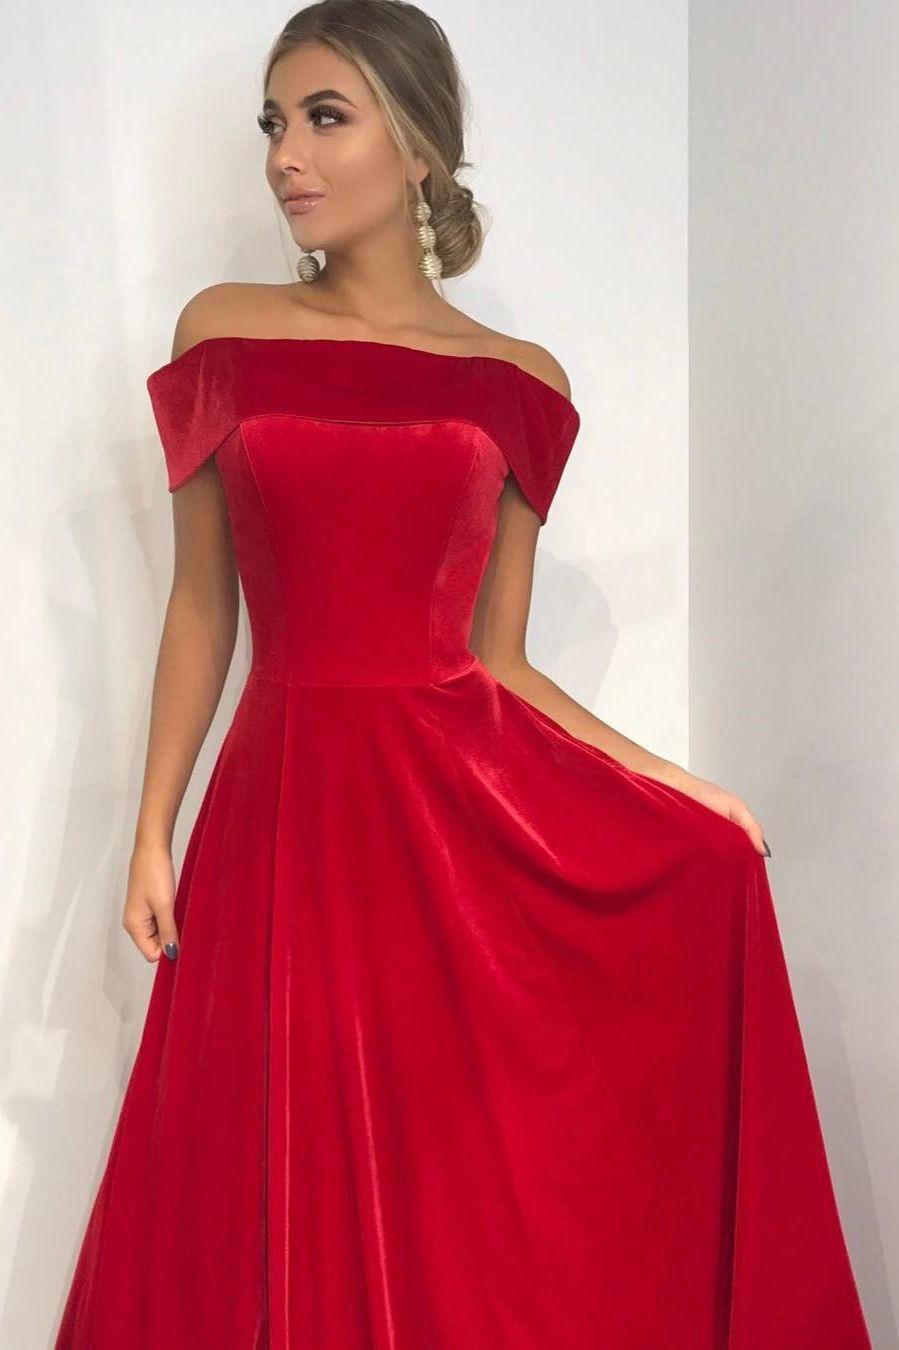 Off The Shoulder Red Velvet Long Prom Dress In 2019 Ball Gown